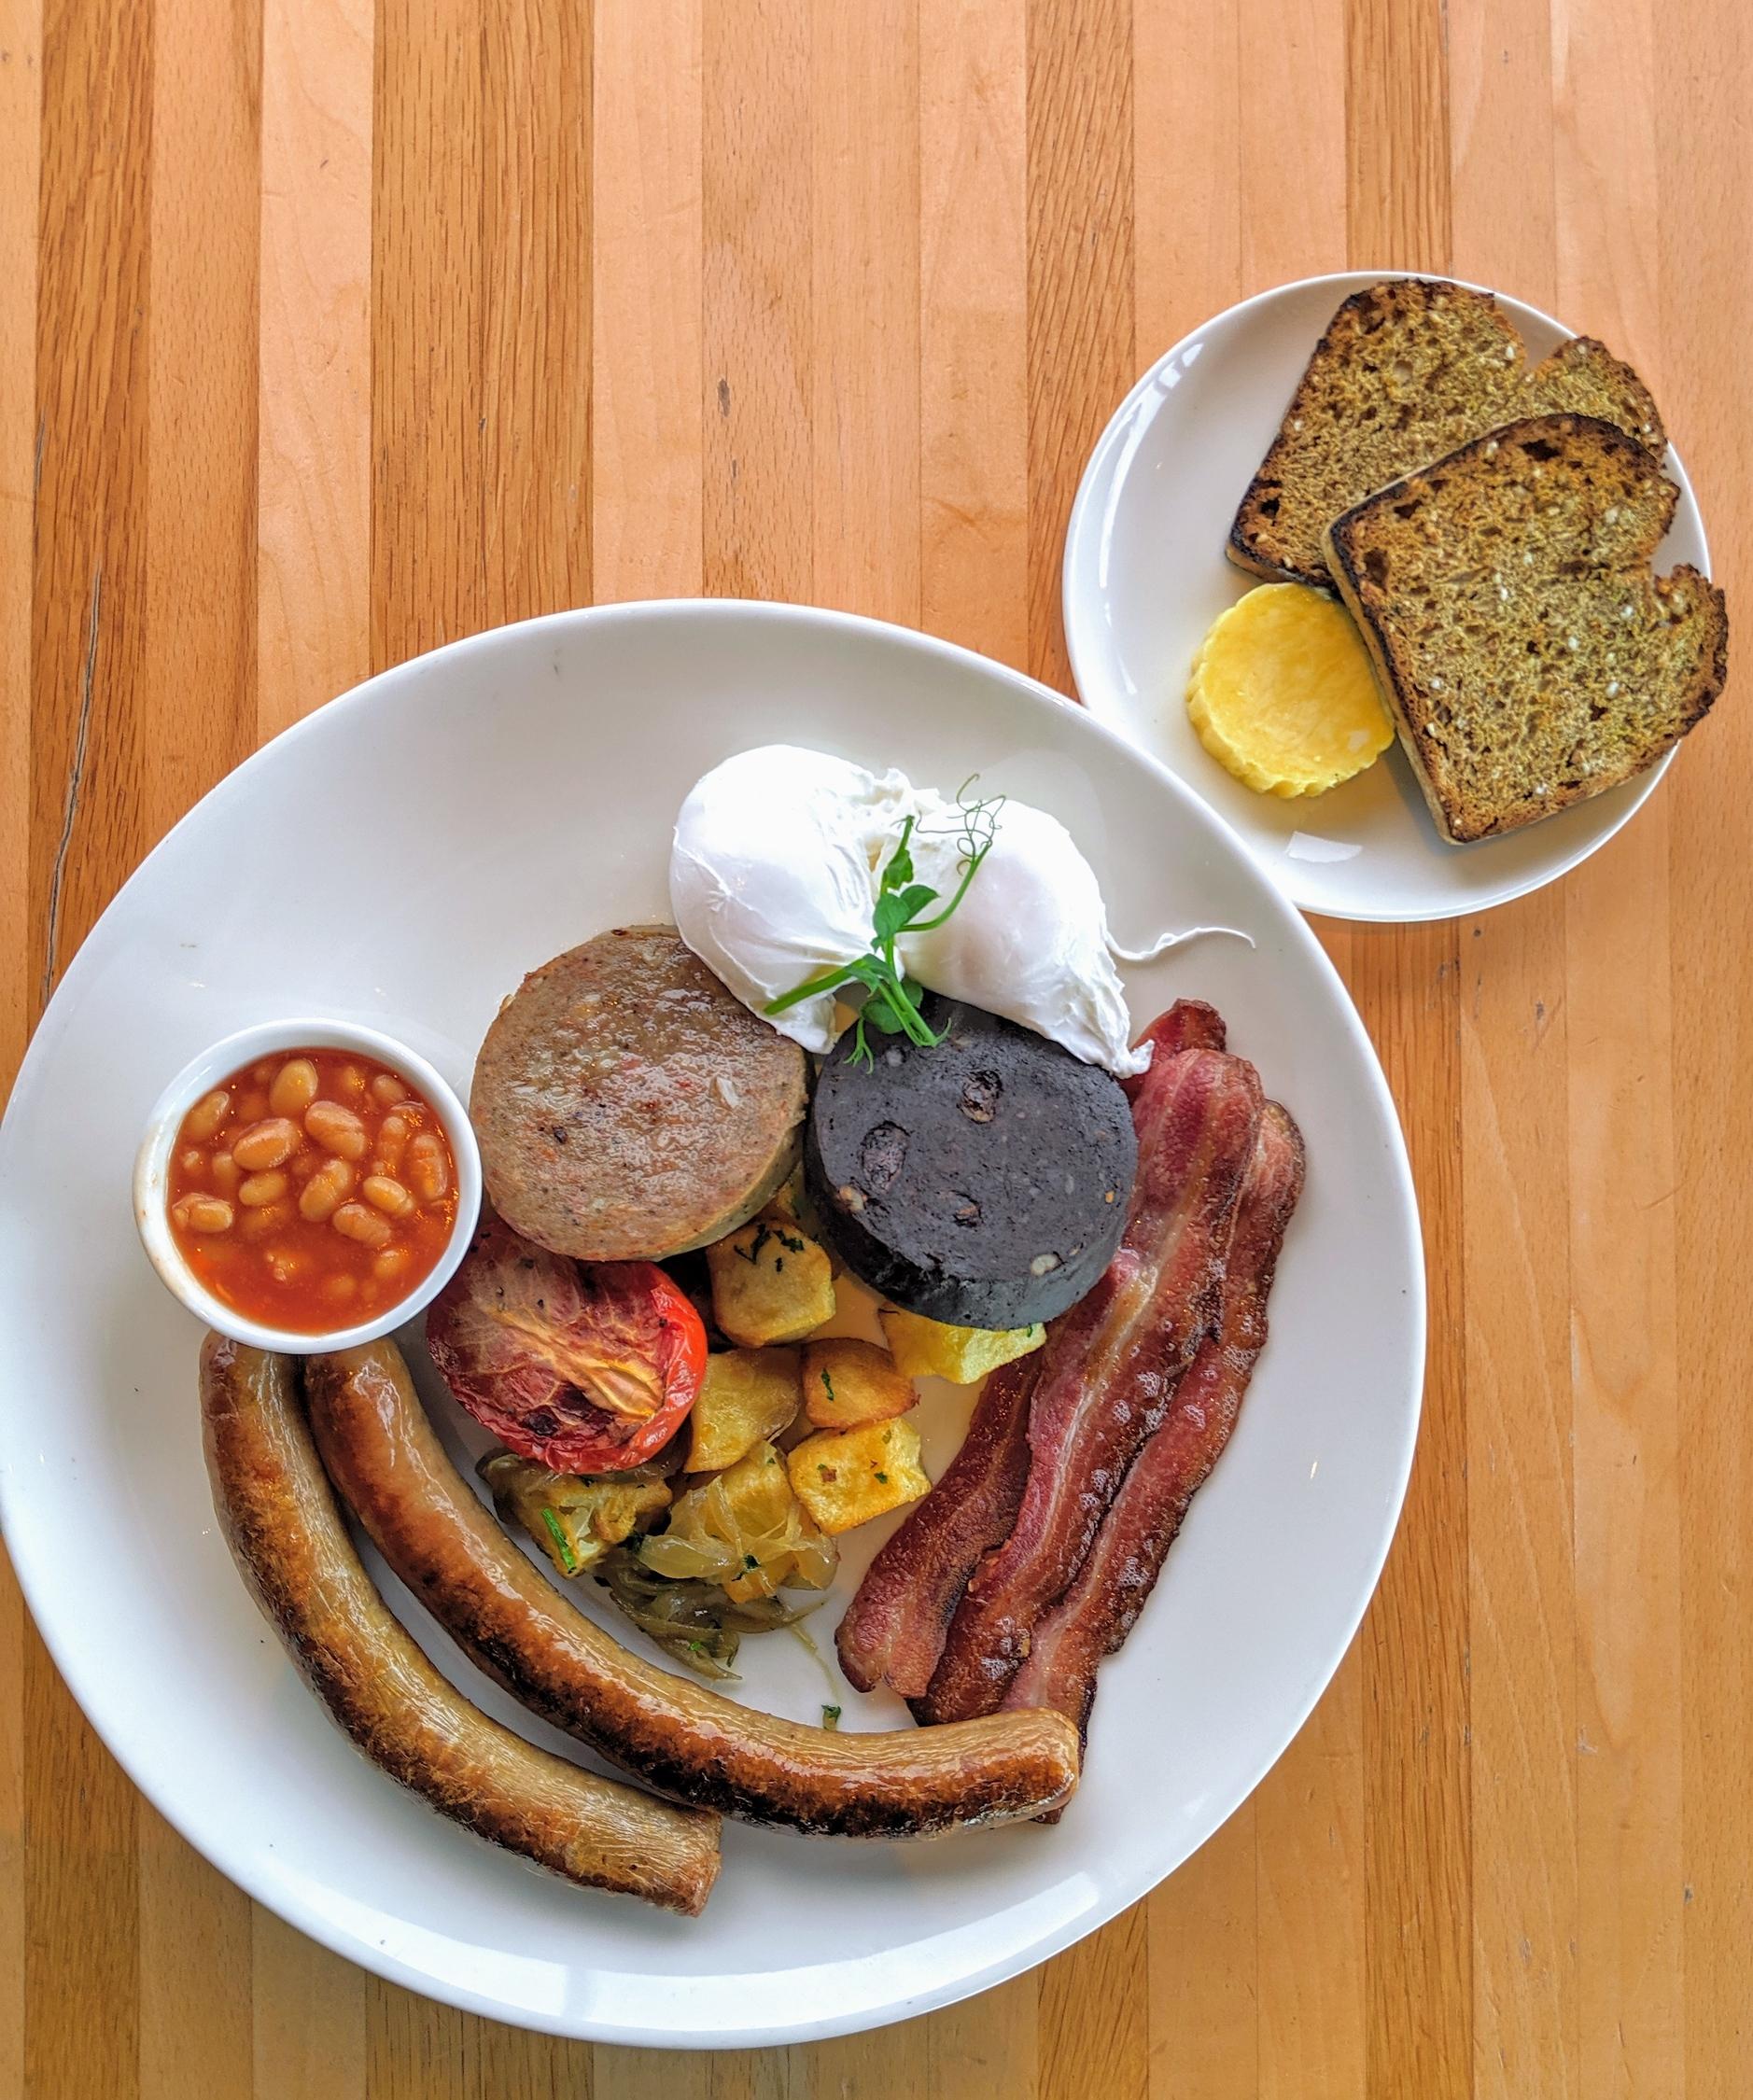 Full Irish Breakfast from The Dean Hotel